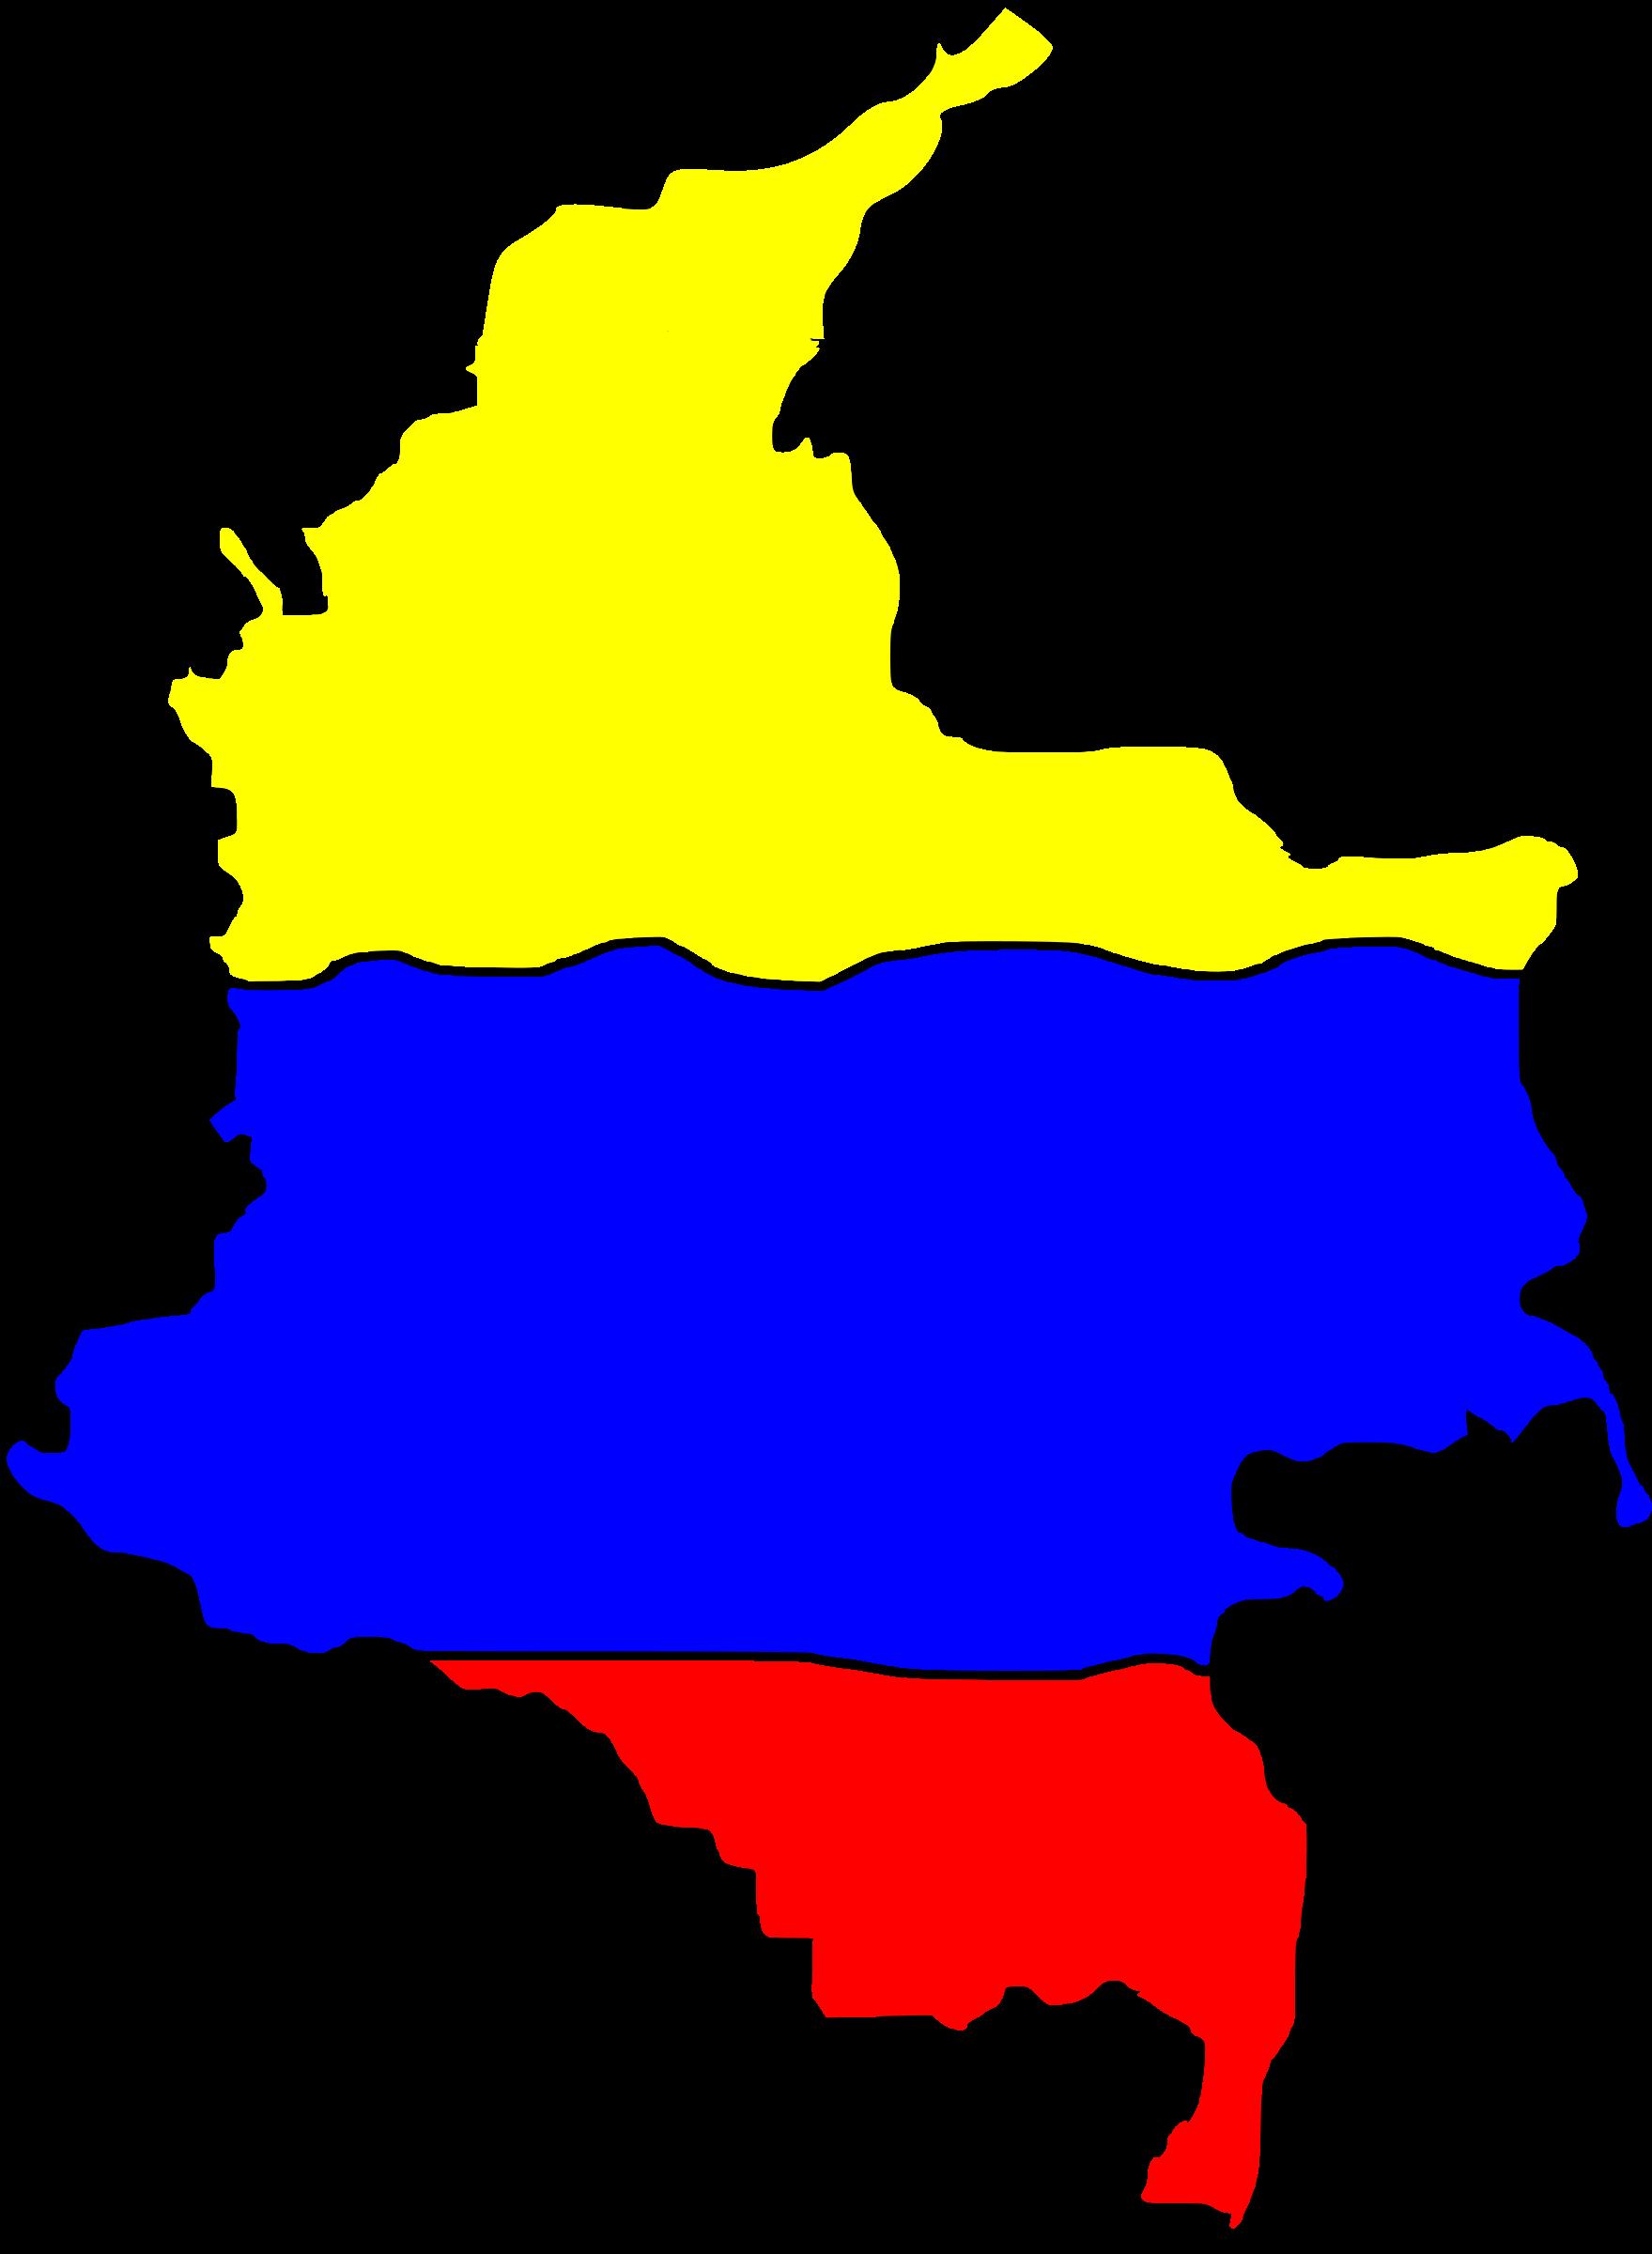 Mapa de colombia clipart.